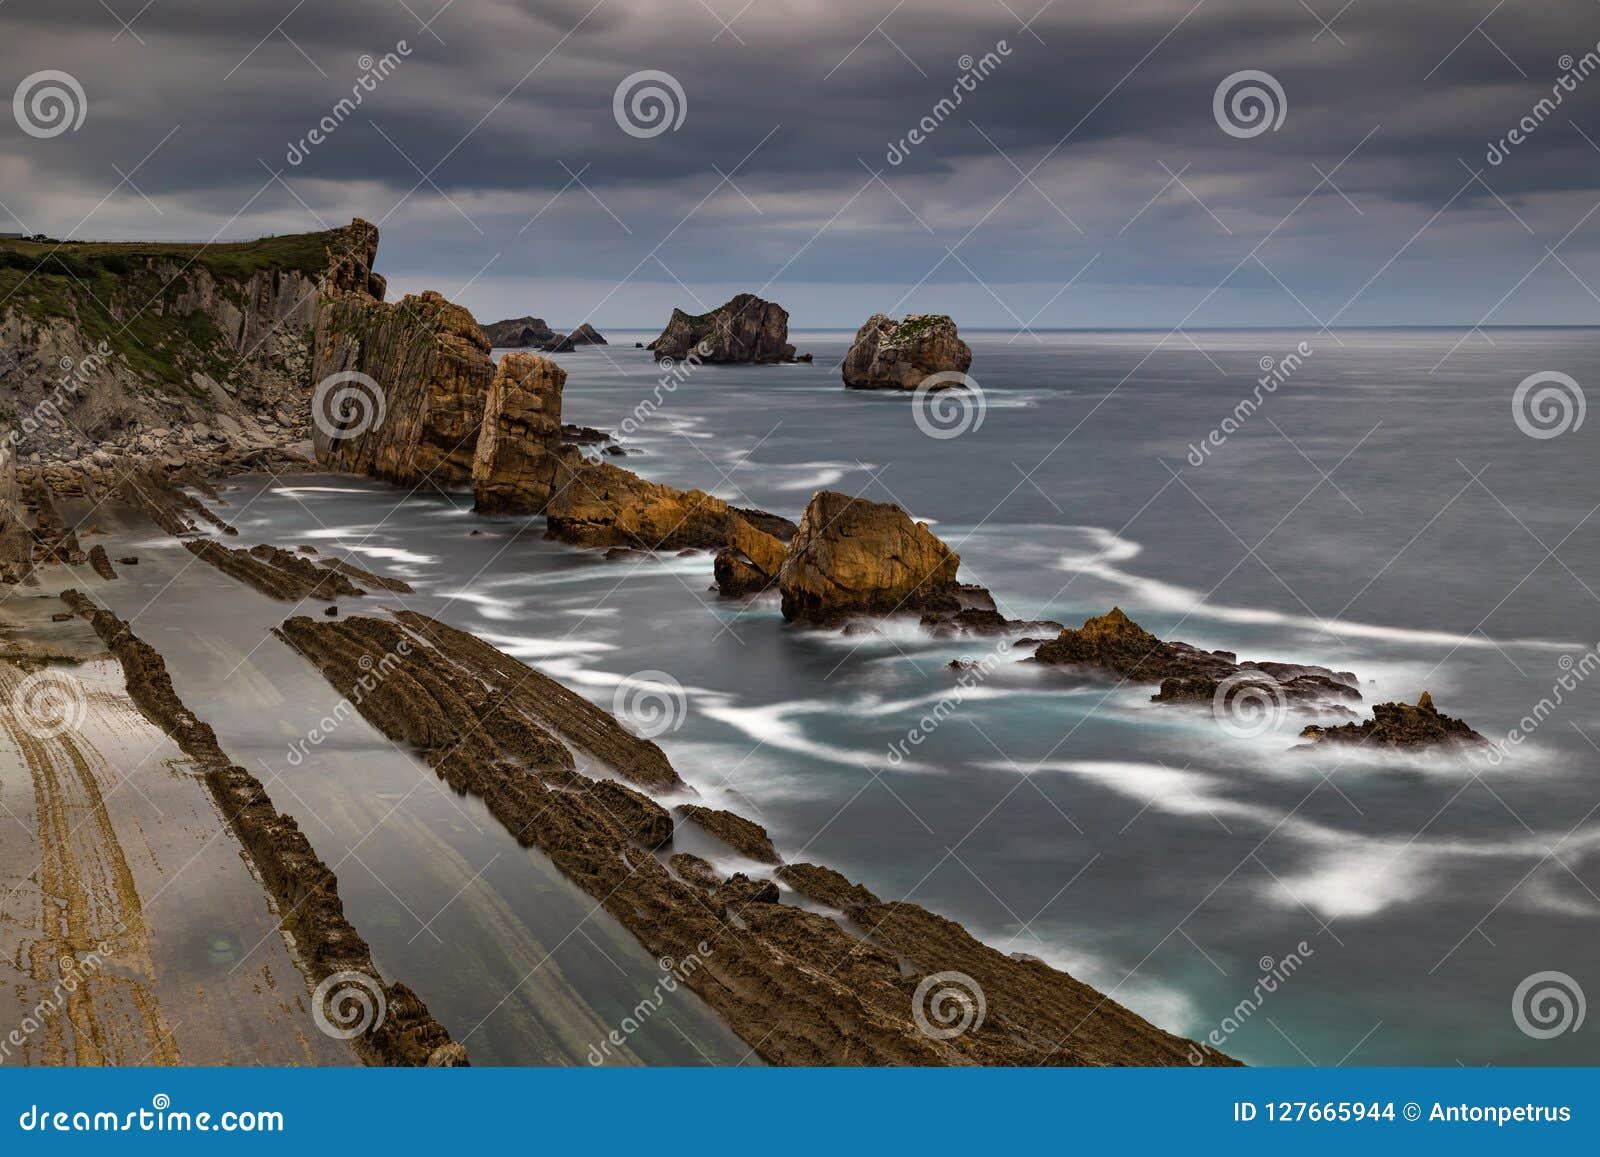 Dramatic view of Playa de la Arnia, Cantabria, Spain.